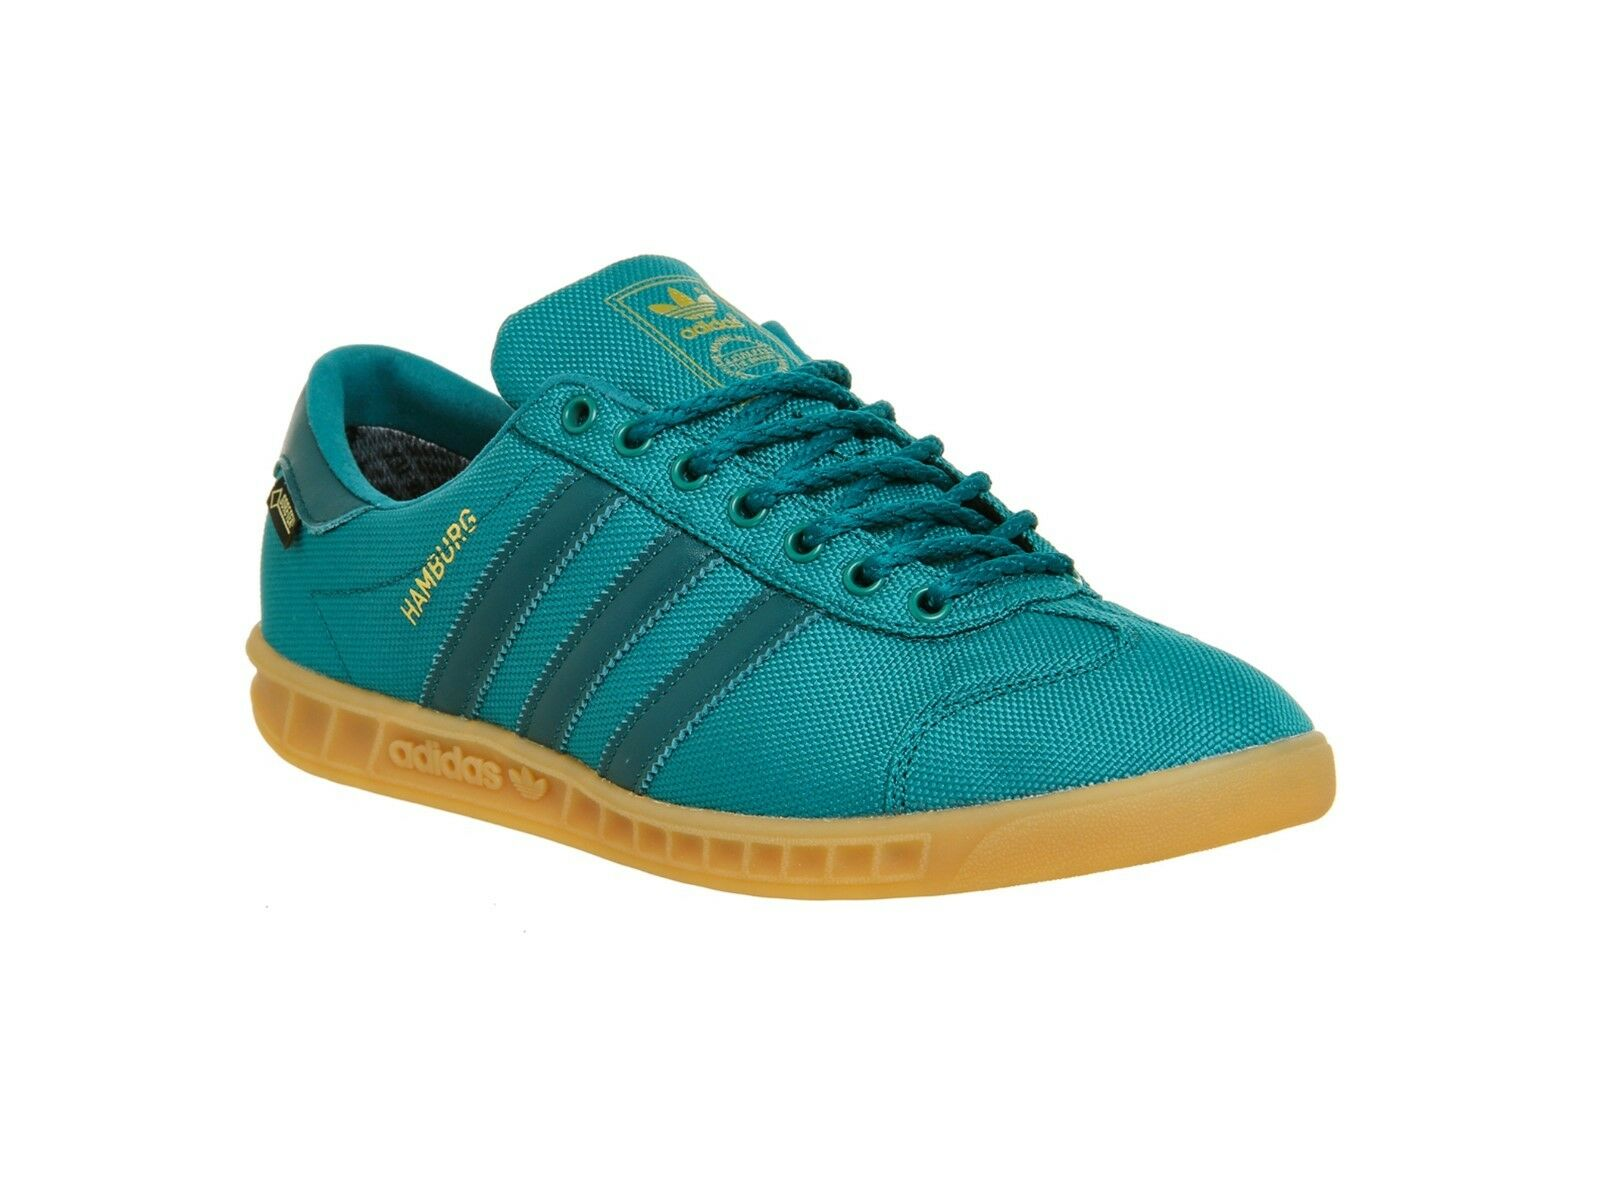 Adidas amburgo gtx + + raro + + eme, verde '11,5 / striscia verde uomini '11,5 verde spezial samba 334158